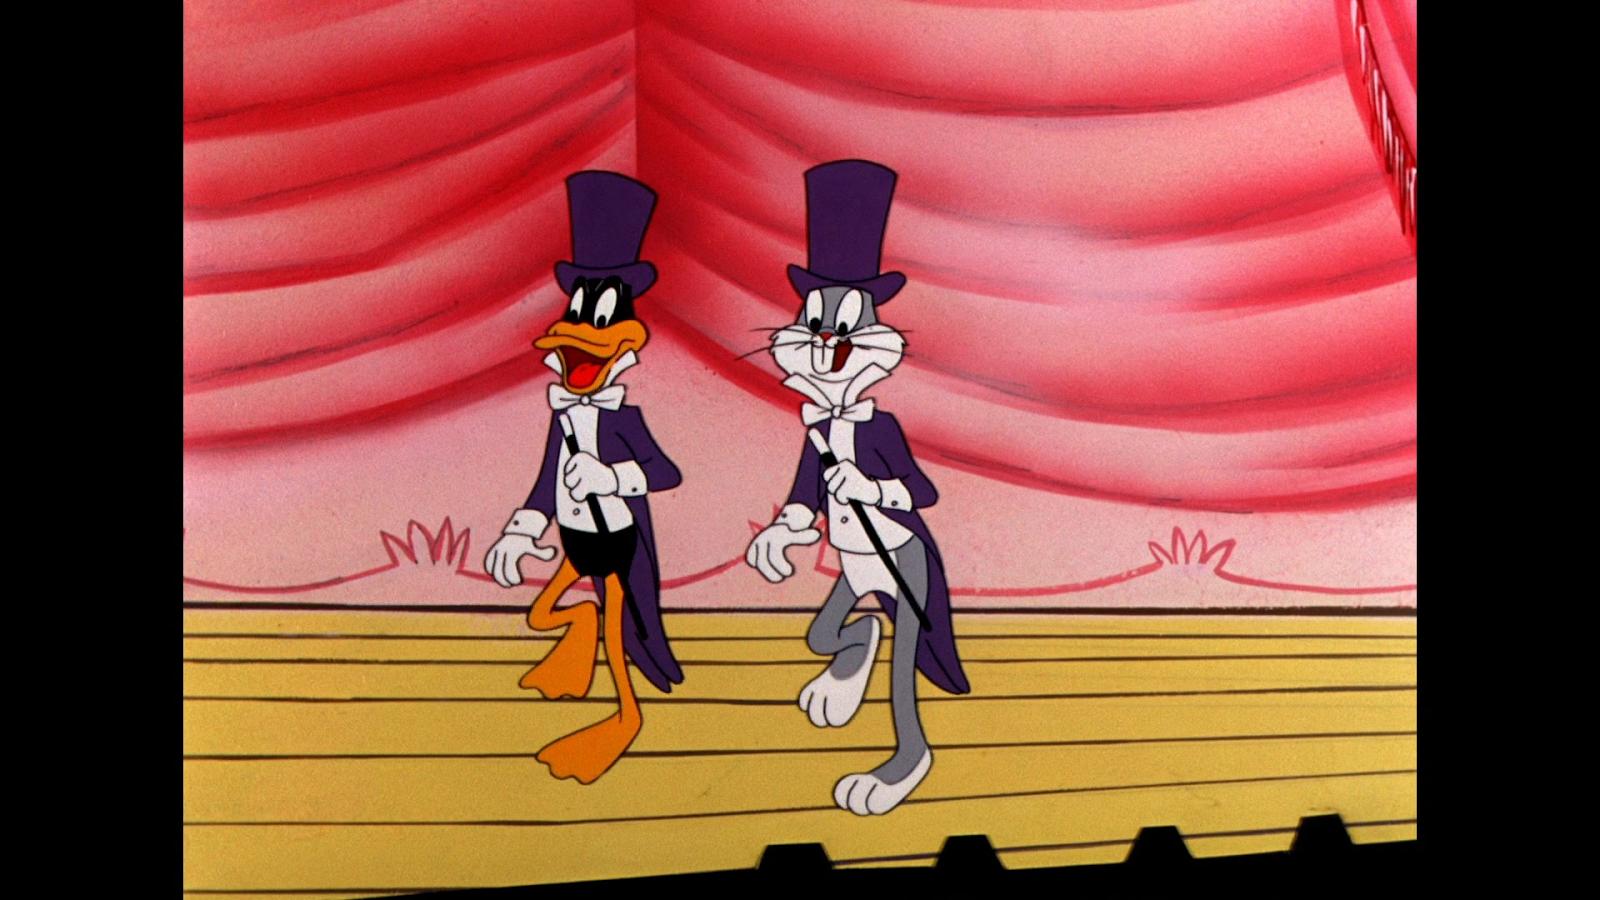 Looney Tunes Platinum Collection (1936-1966) 1080p BD25 4